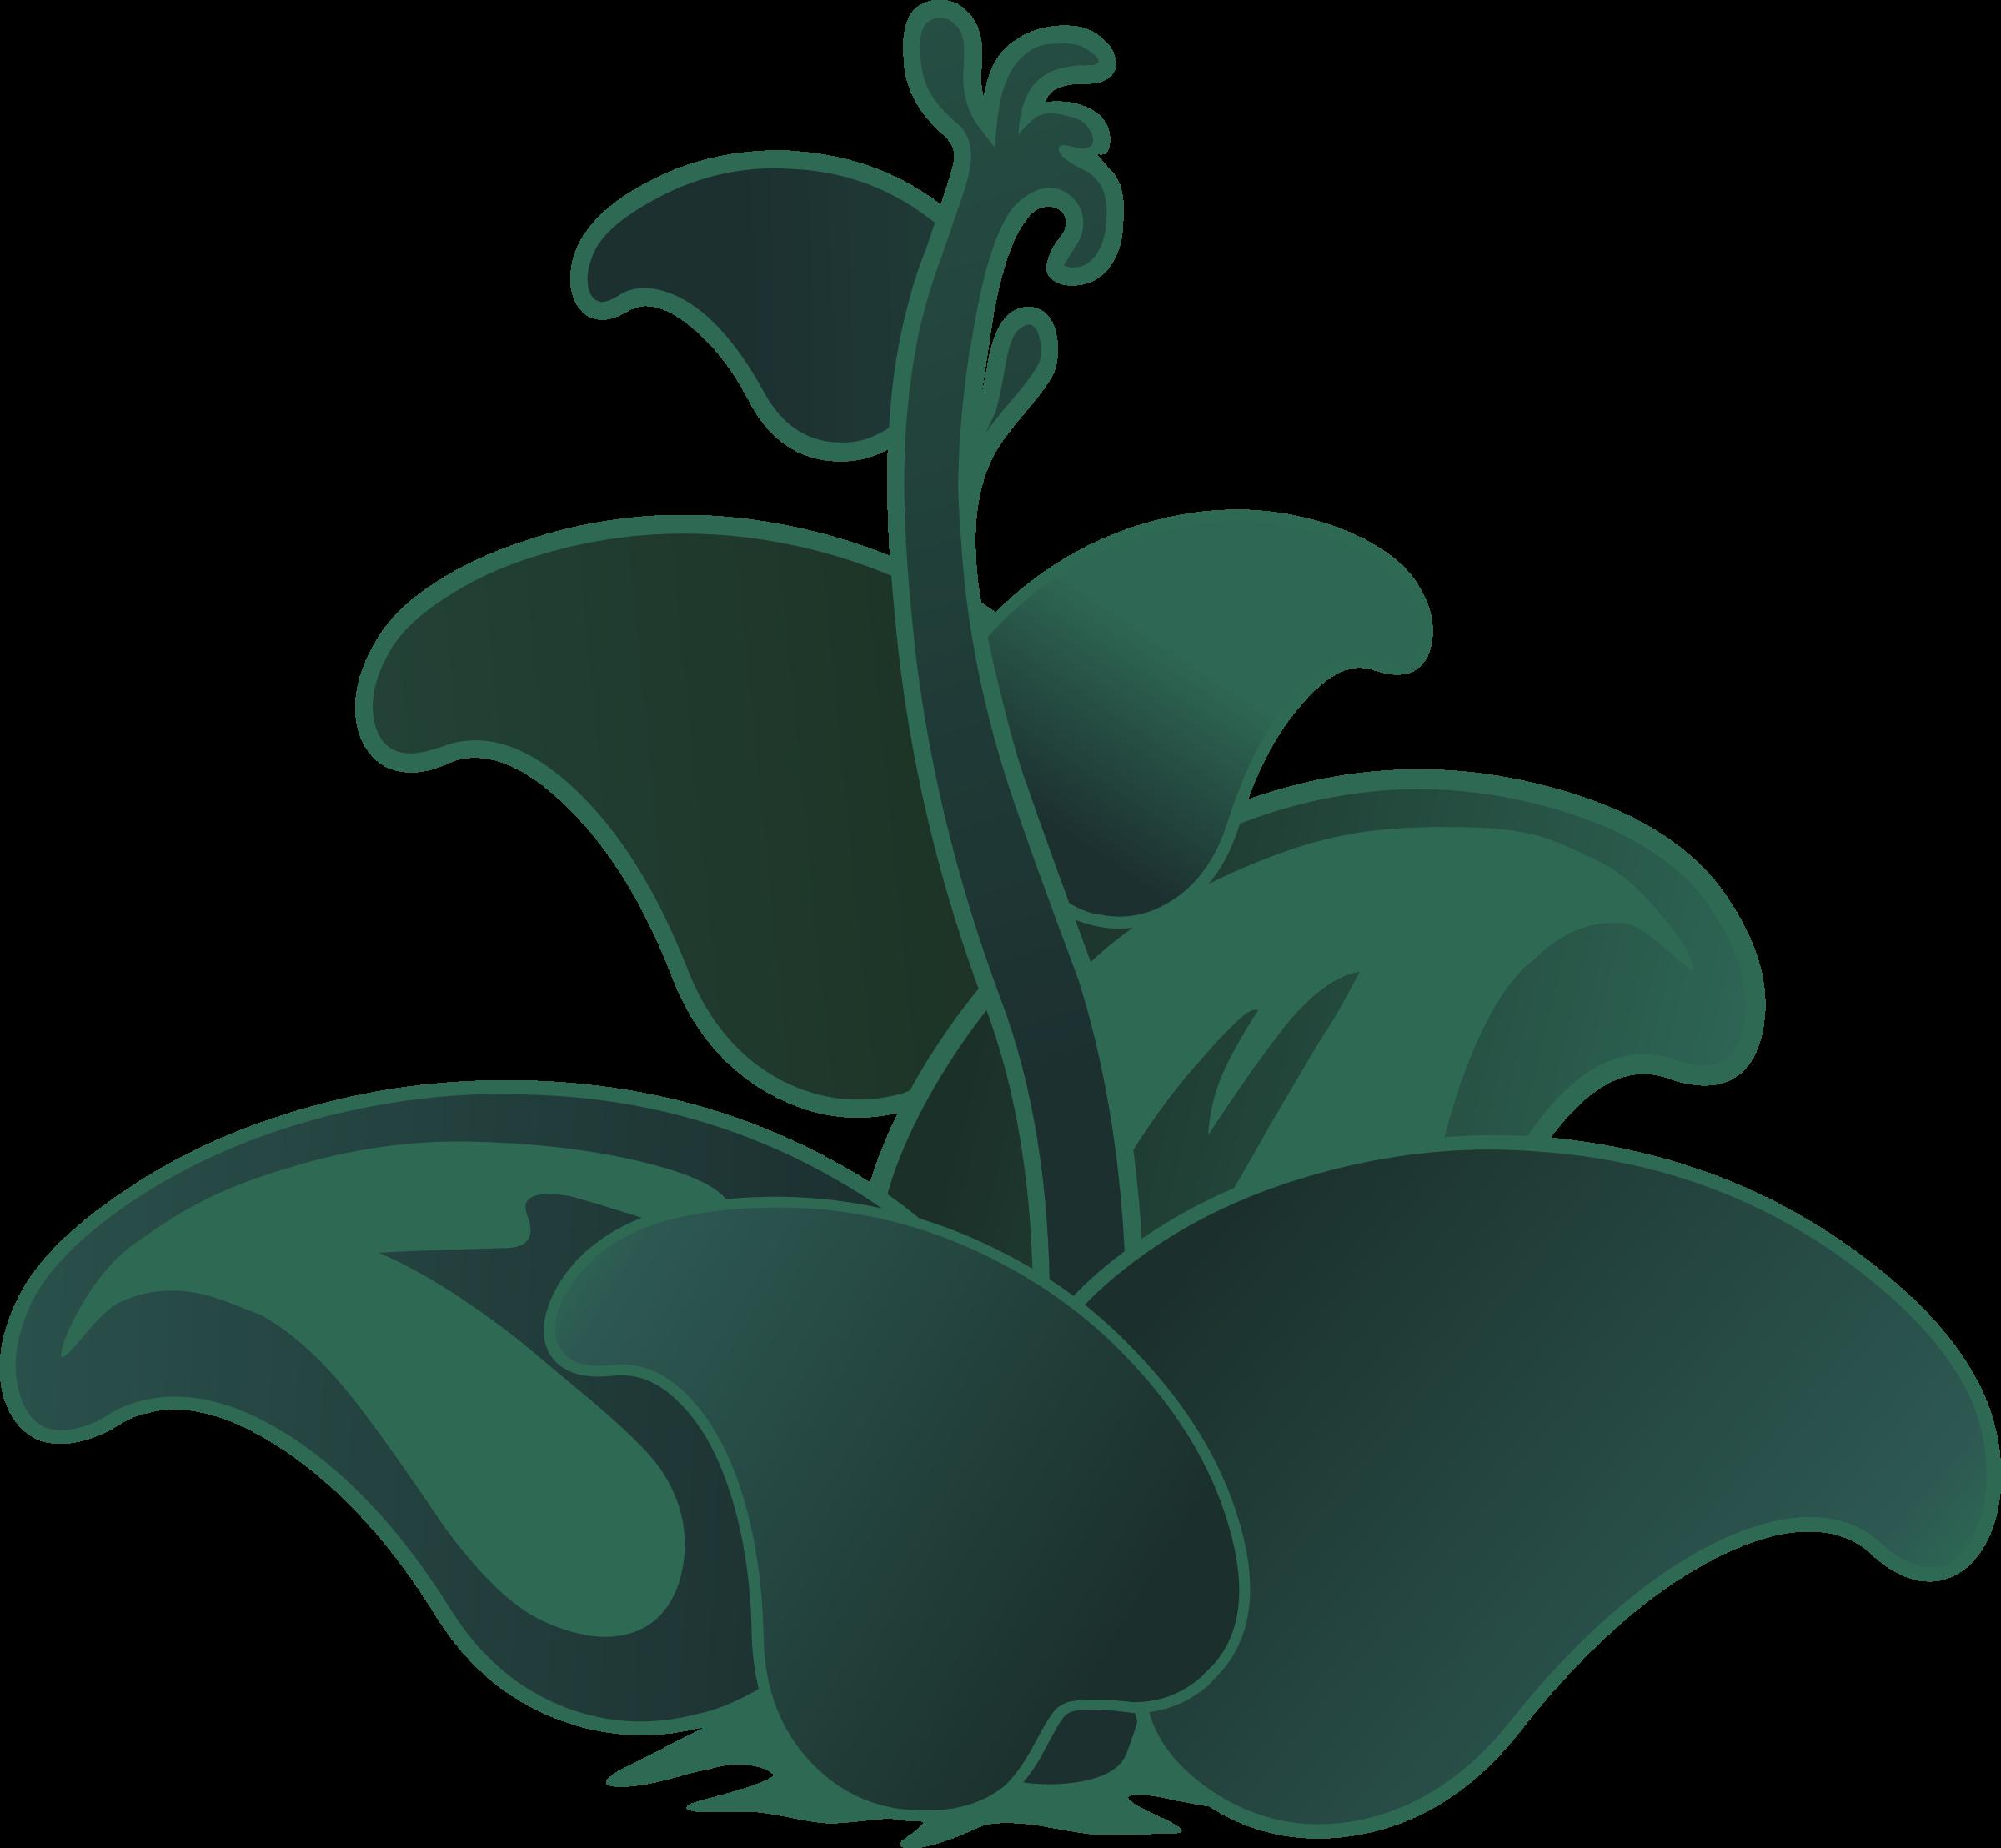 Glitch clipart flowery #9